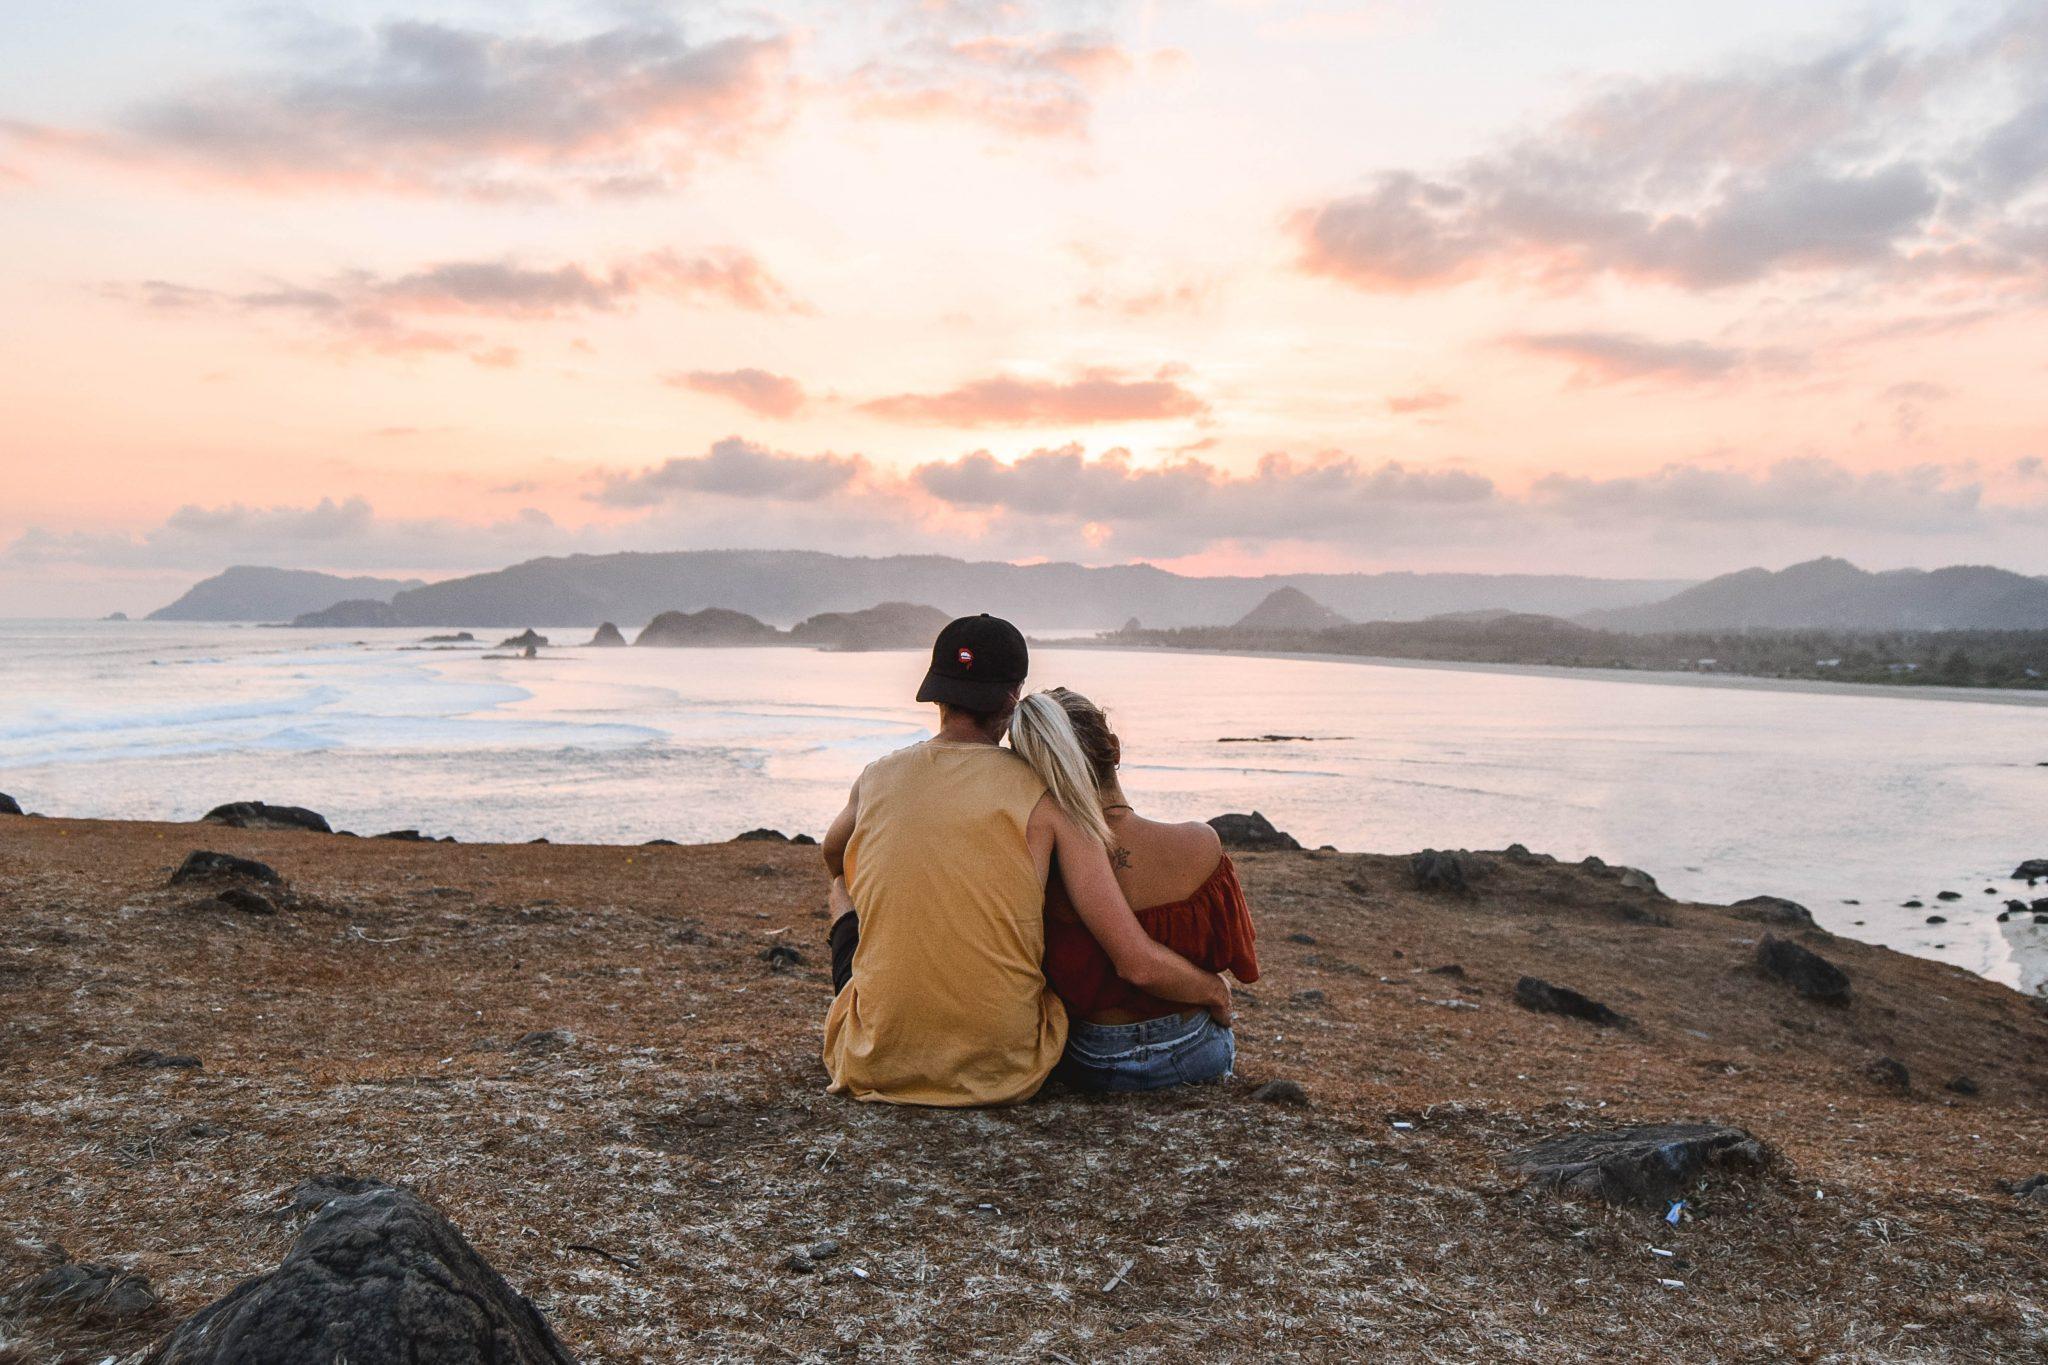 Wanderers & Warriors - Charlie & Lauren UK Travel Couple - Merese Hill Bukit Merese Lombok Sunset Things To Do In Kuta Lombok